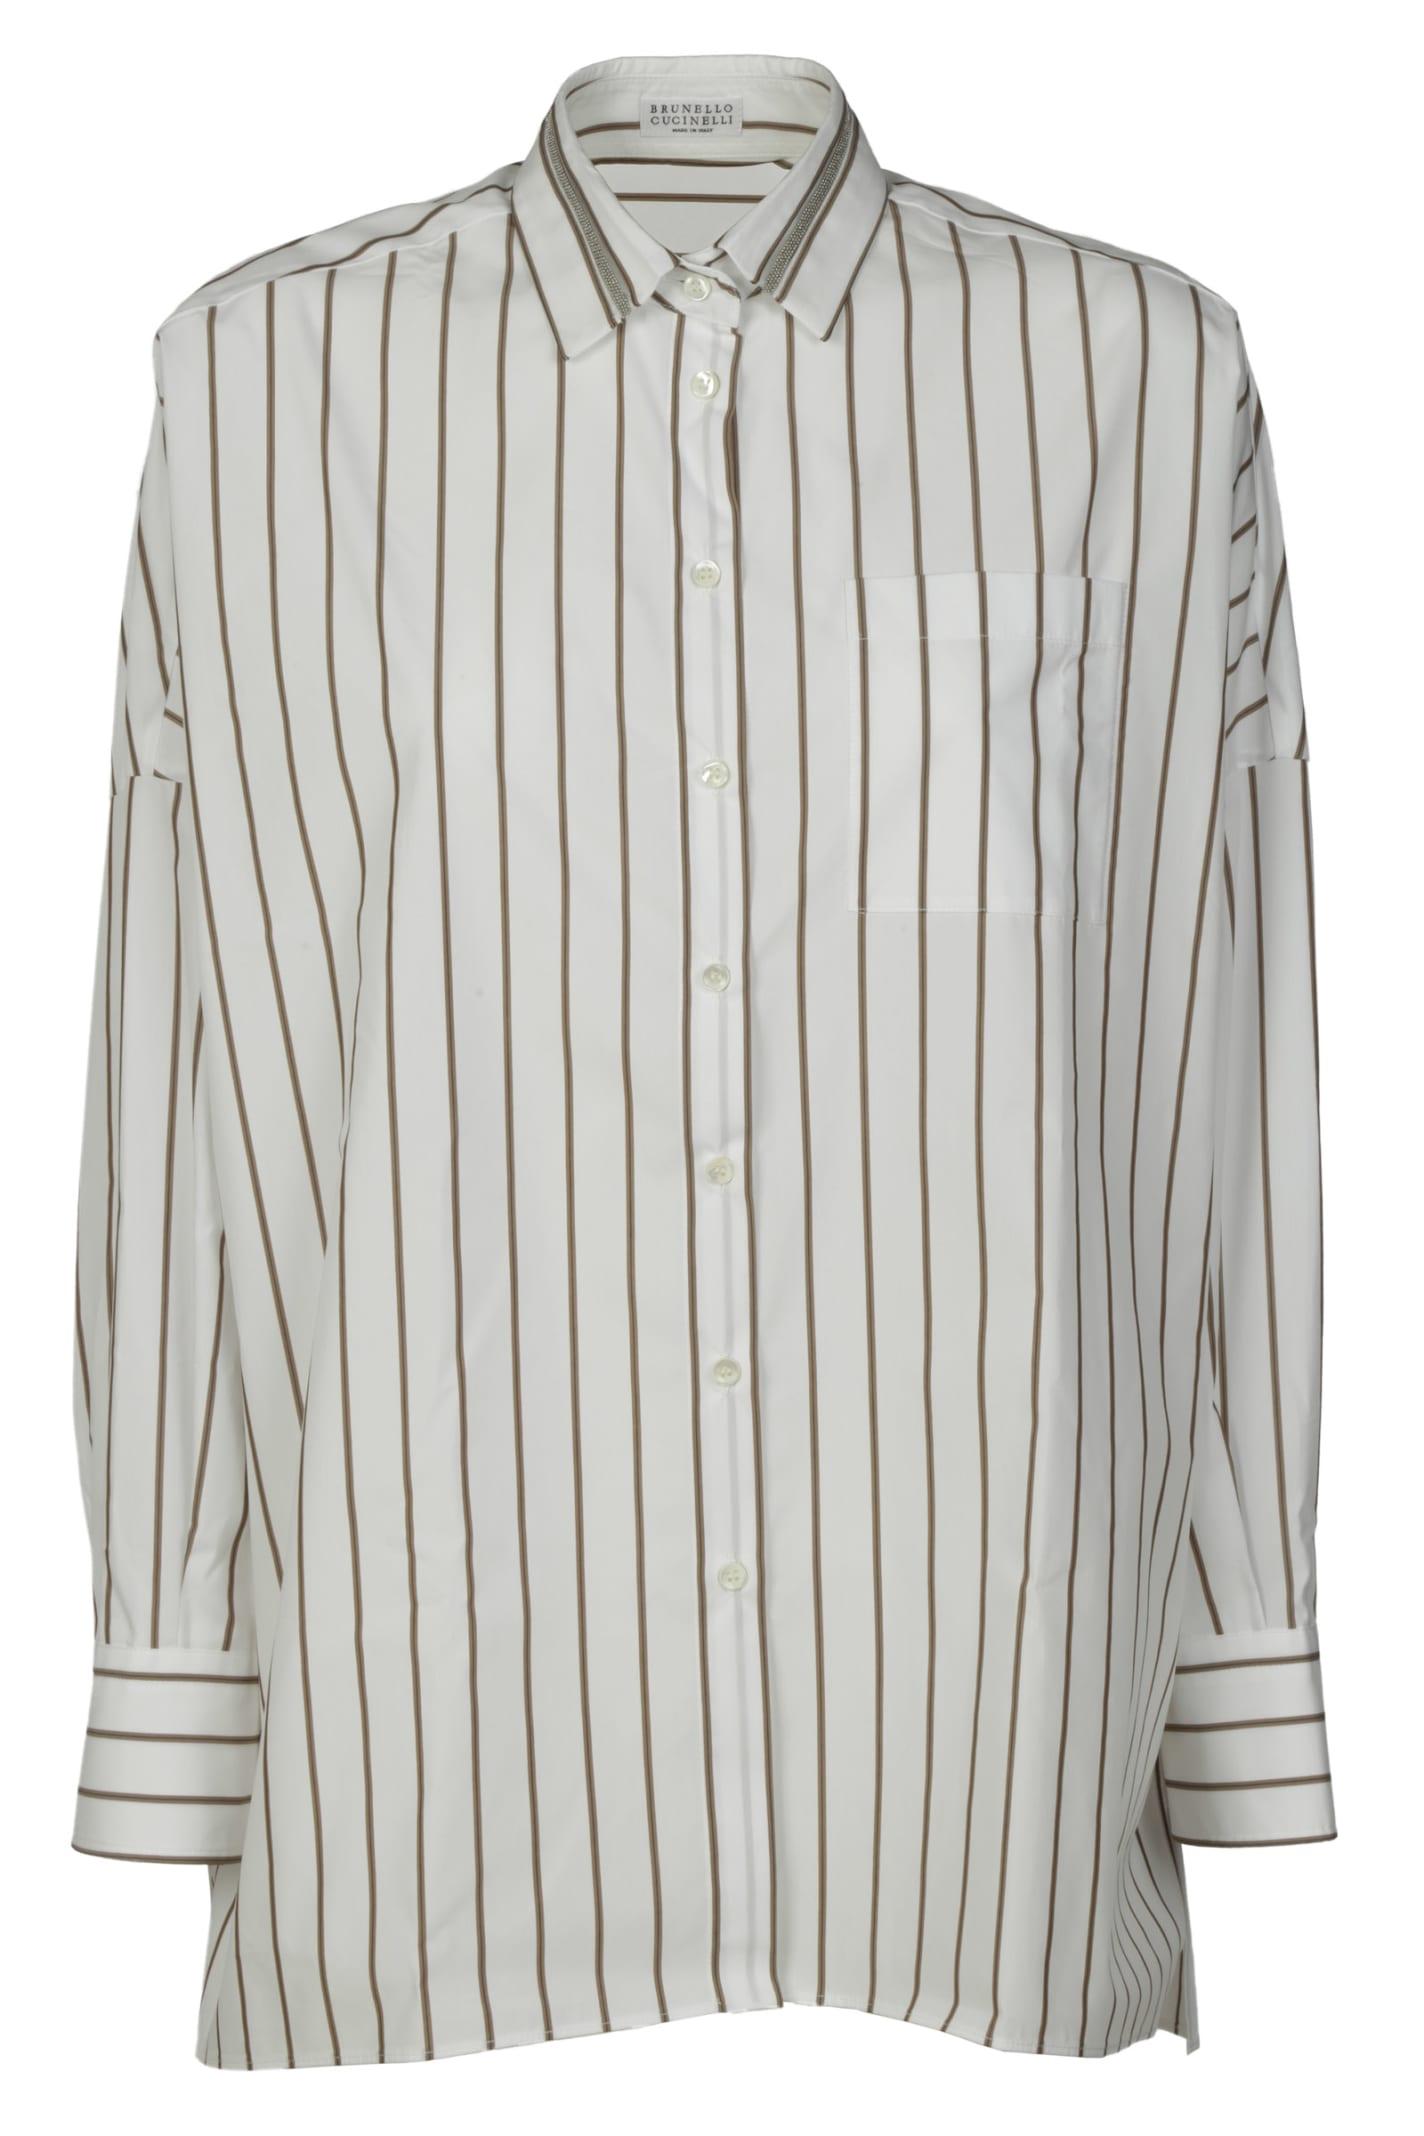 Brunello Cucinelli Stripe Print Shirt